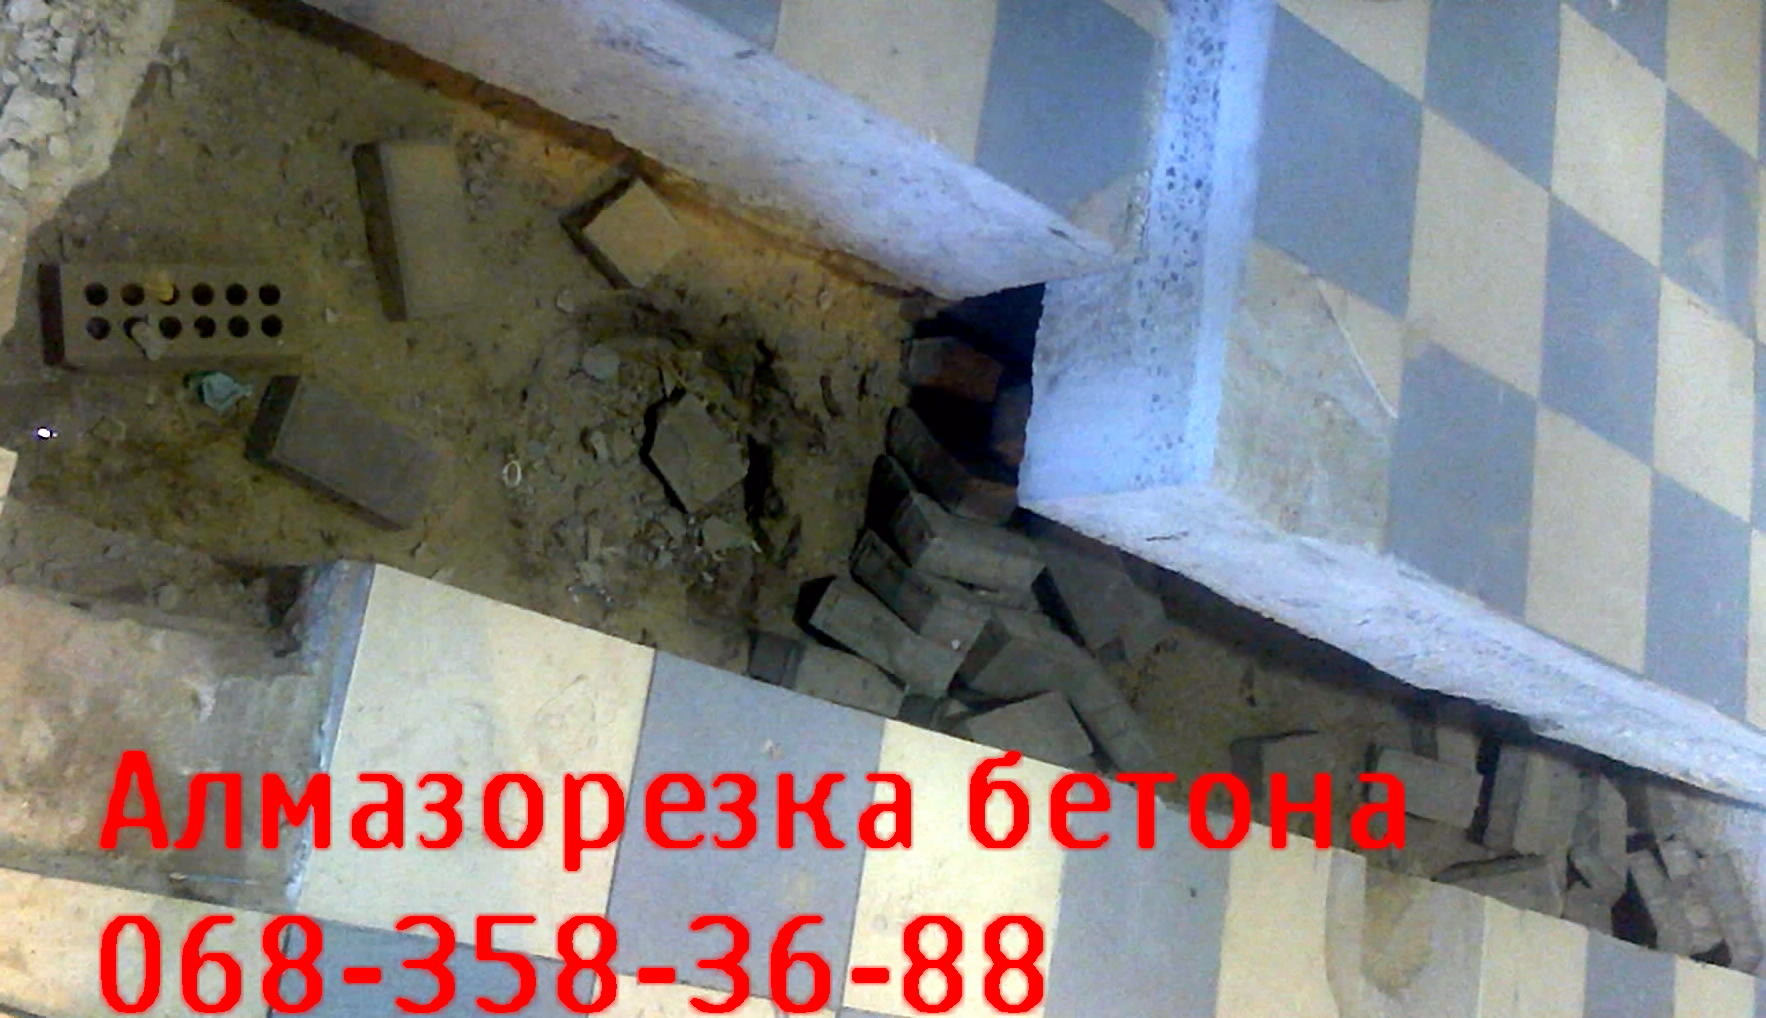 Нажмите на изображение для увеличения Название: Фото0147.jpg Просмотров: 11 Размер:241.2 Кб ID:595165